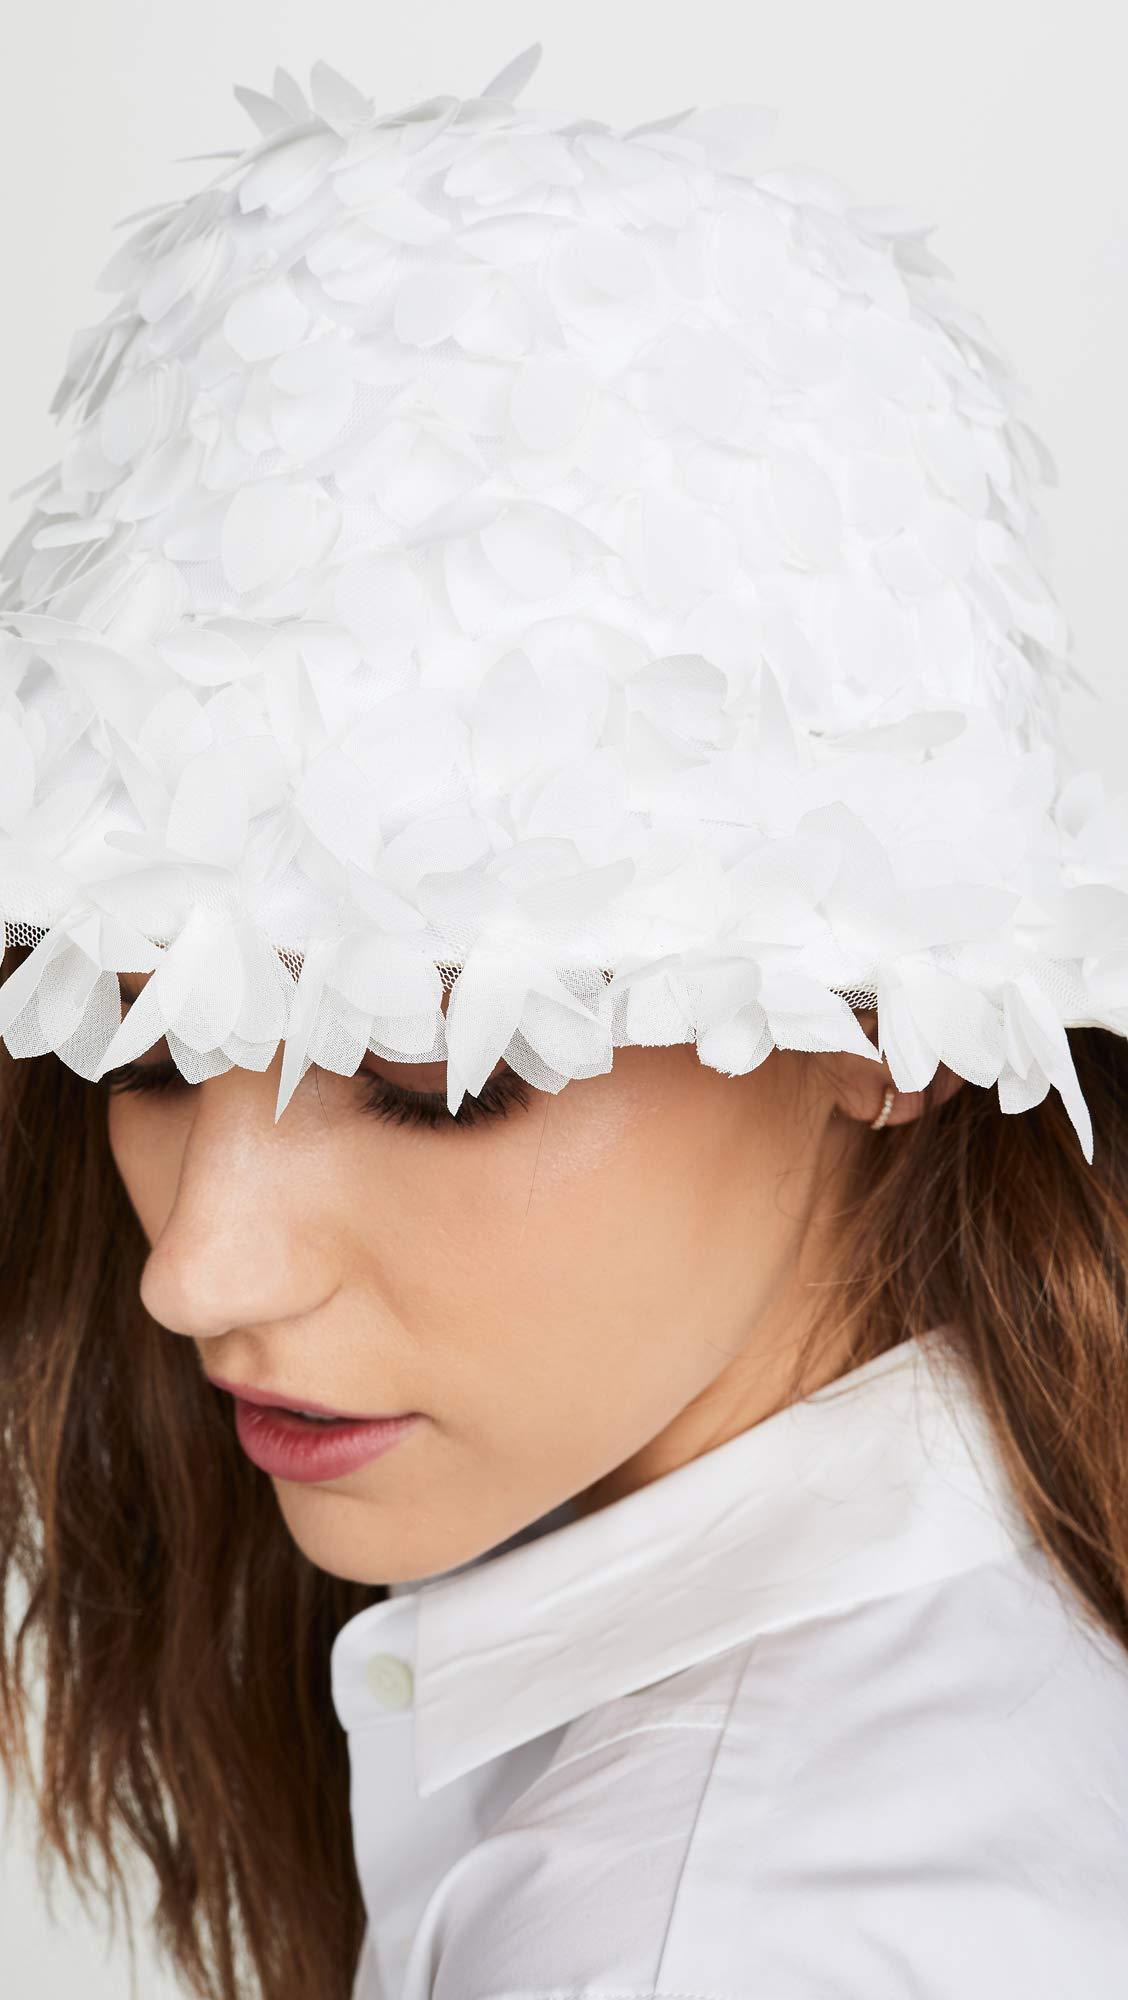 Eugenia Kim Women's Toby Bucket Hat, White, One Size by Eugenia Kim (Image #3)